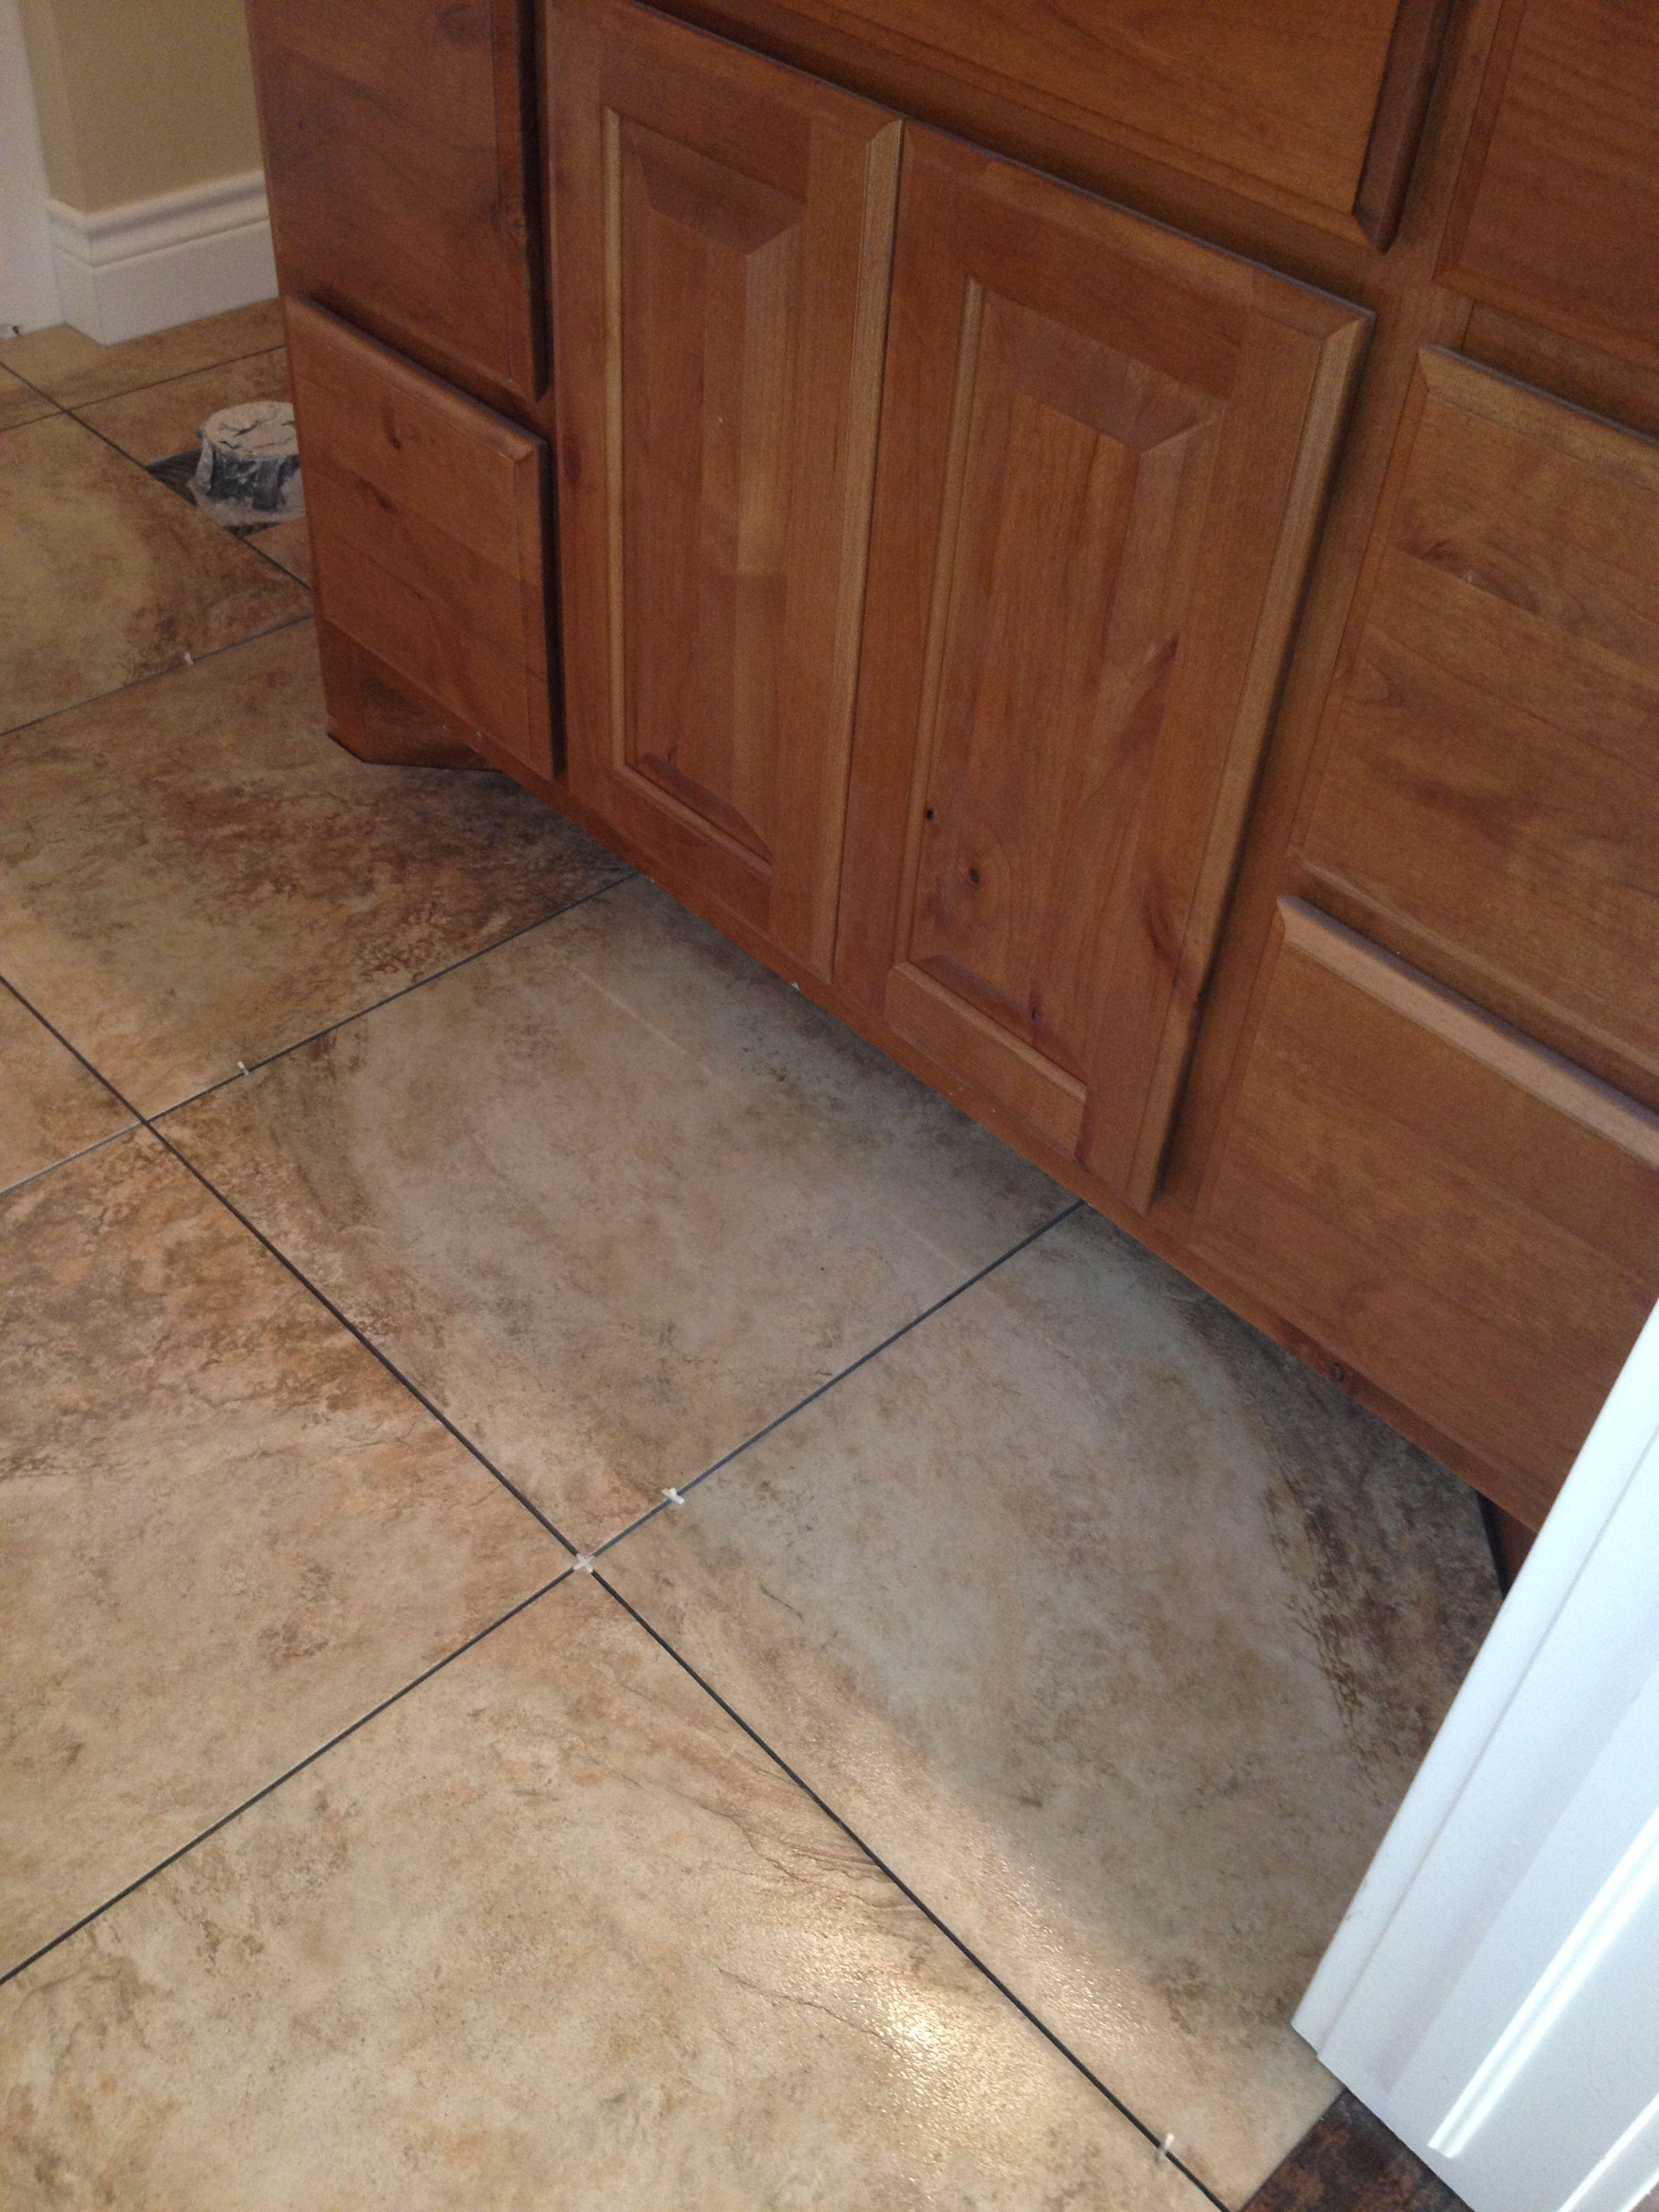 Mesa Beige 18 Ceramic Floor Tiles Guest Bath My Home Colors